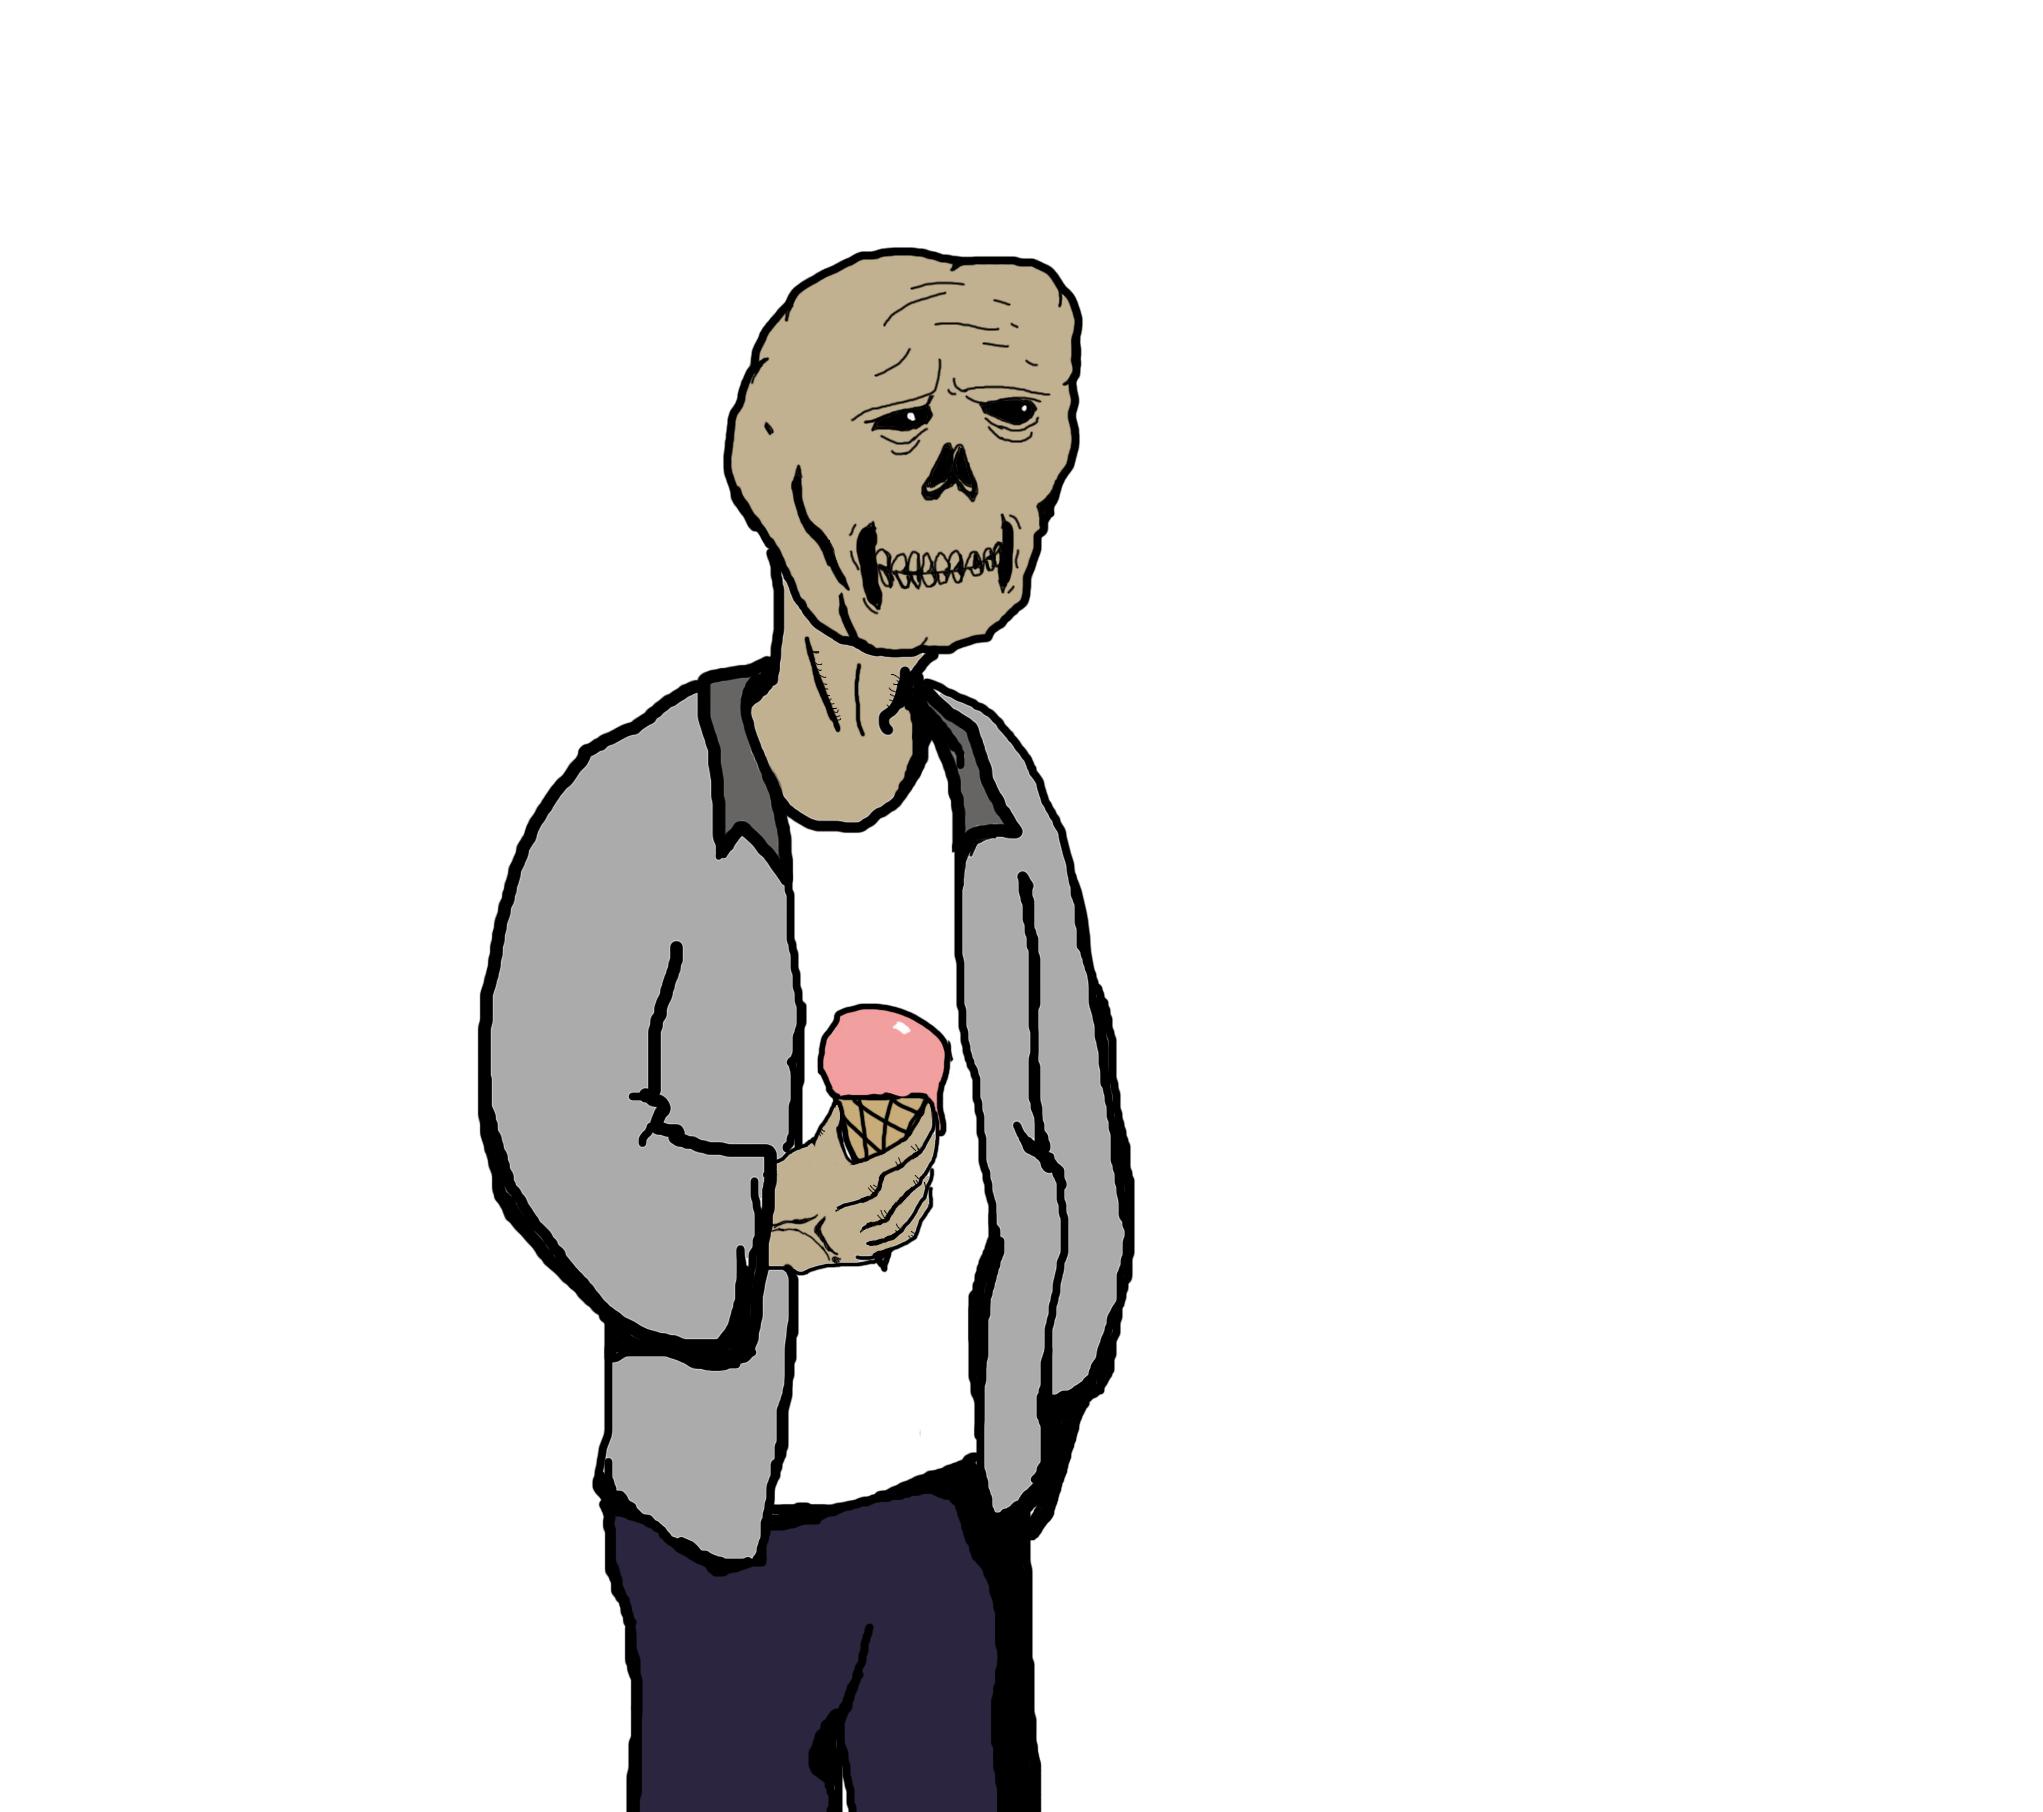 Ice Cream dude